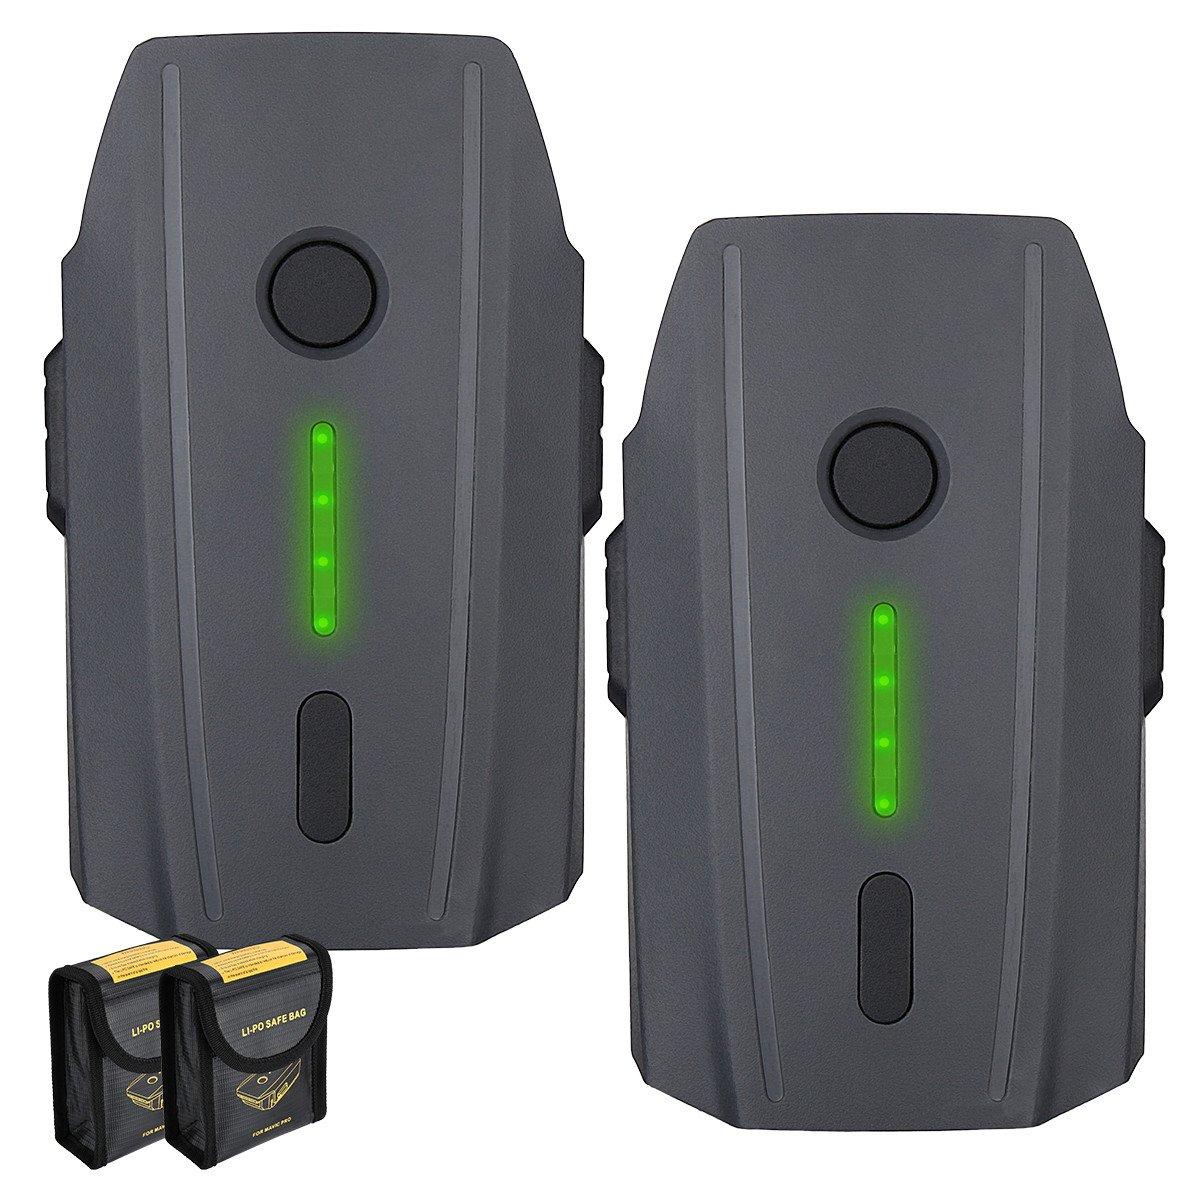 Powerextra Mavic Pro Battery 2-Pack 11.4V 3830 mAh LiPo Intelligent Flight Battery Replacement for DJI Mavic Pro /& Platinum /& Alpine White Drone Not Fit for Mavic 2